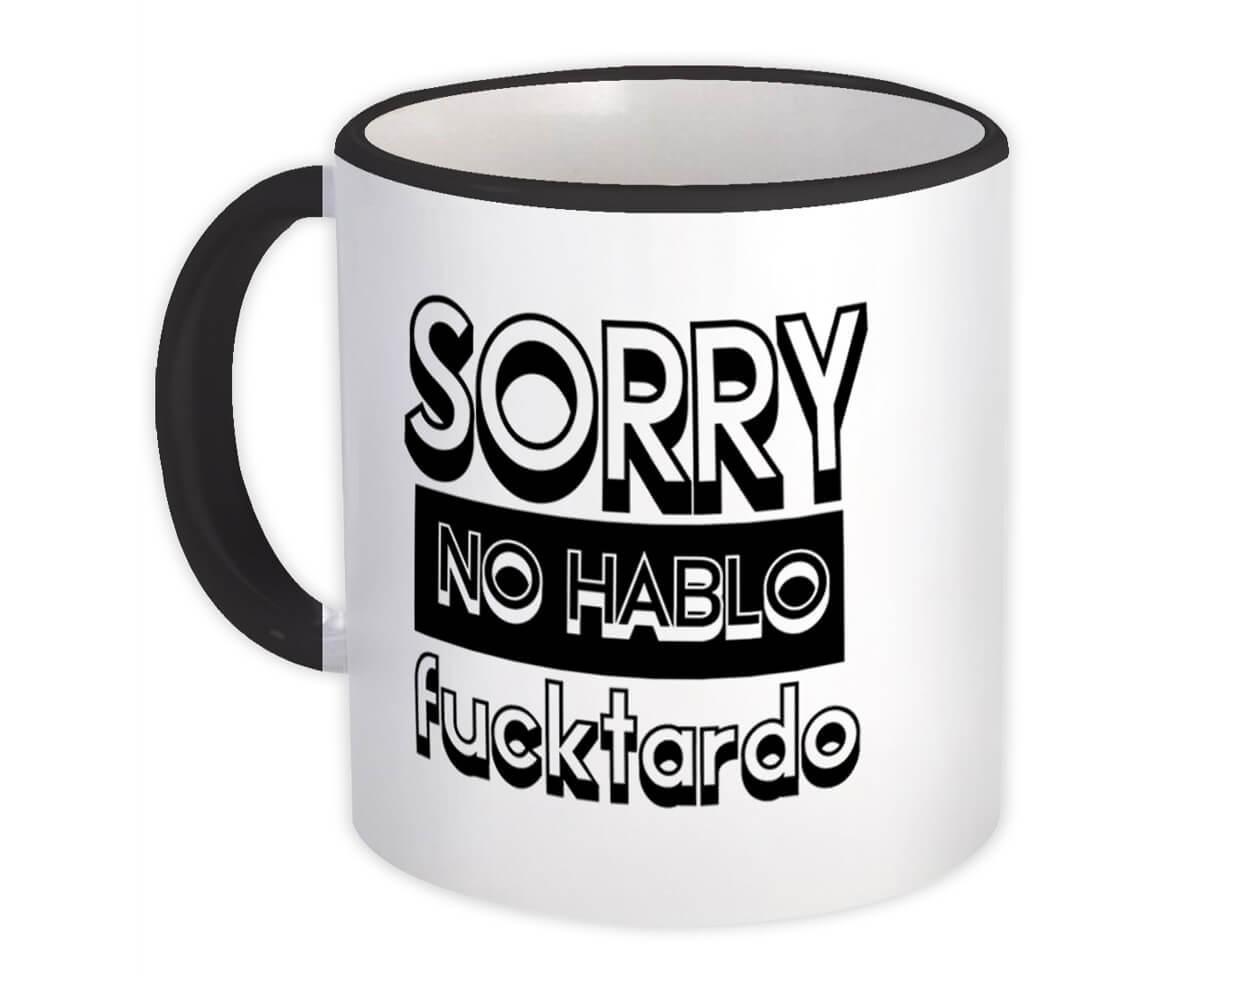 Sorry No Hablo Fucktardo : Gift Mug Funny Novelty Joke